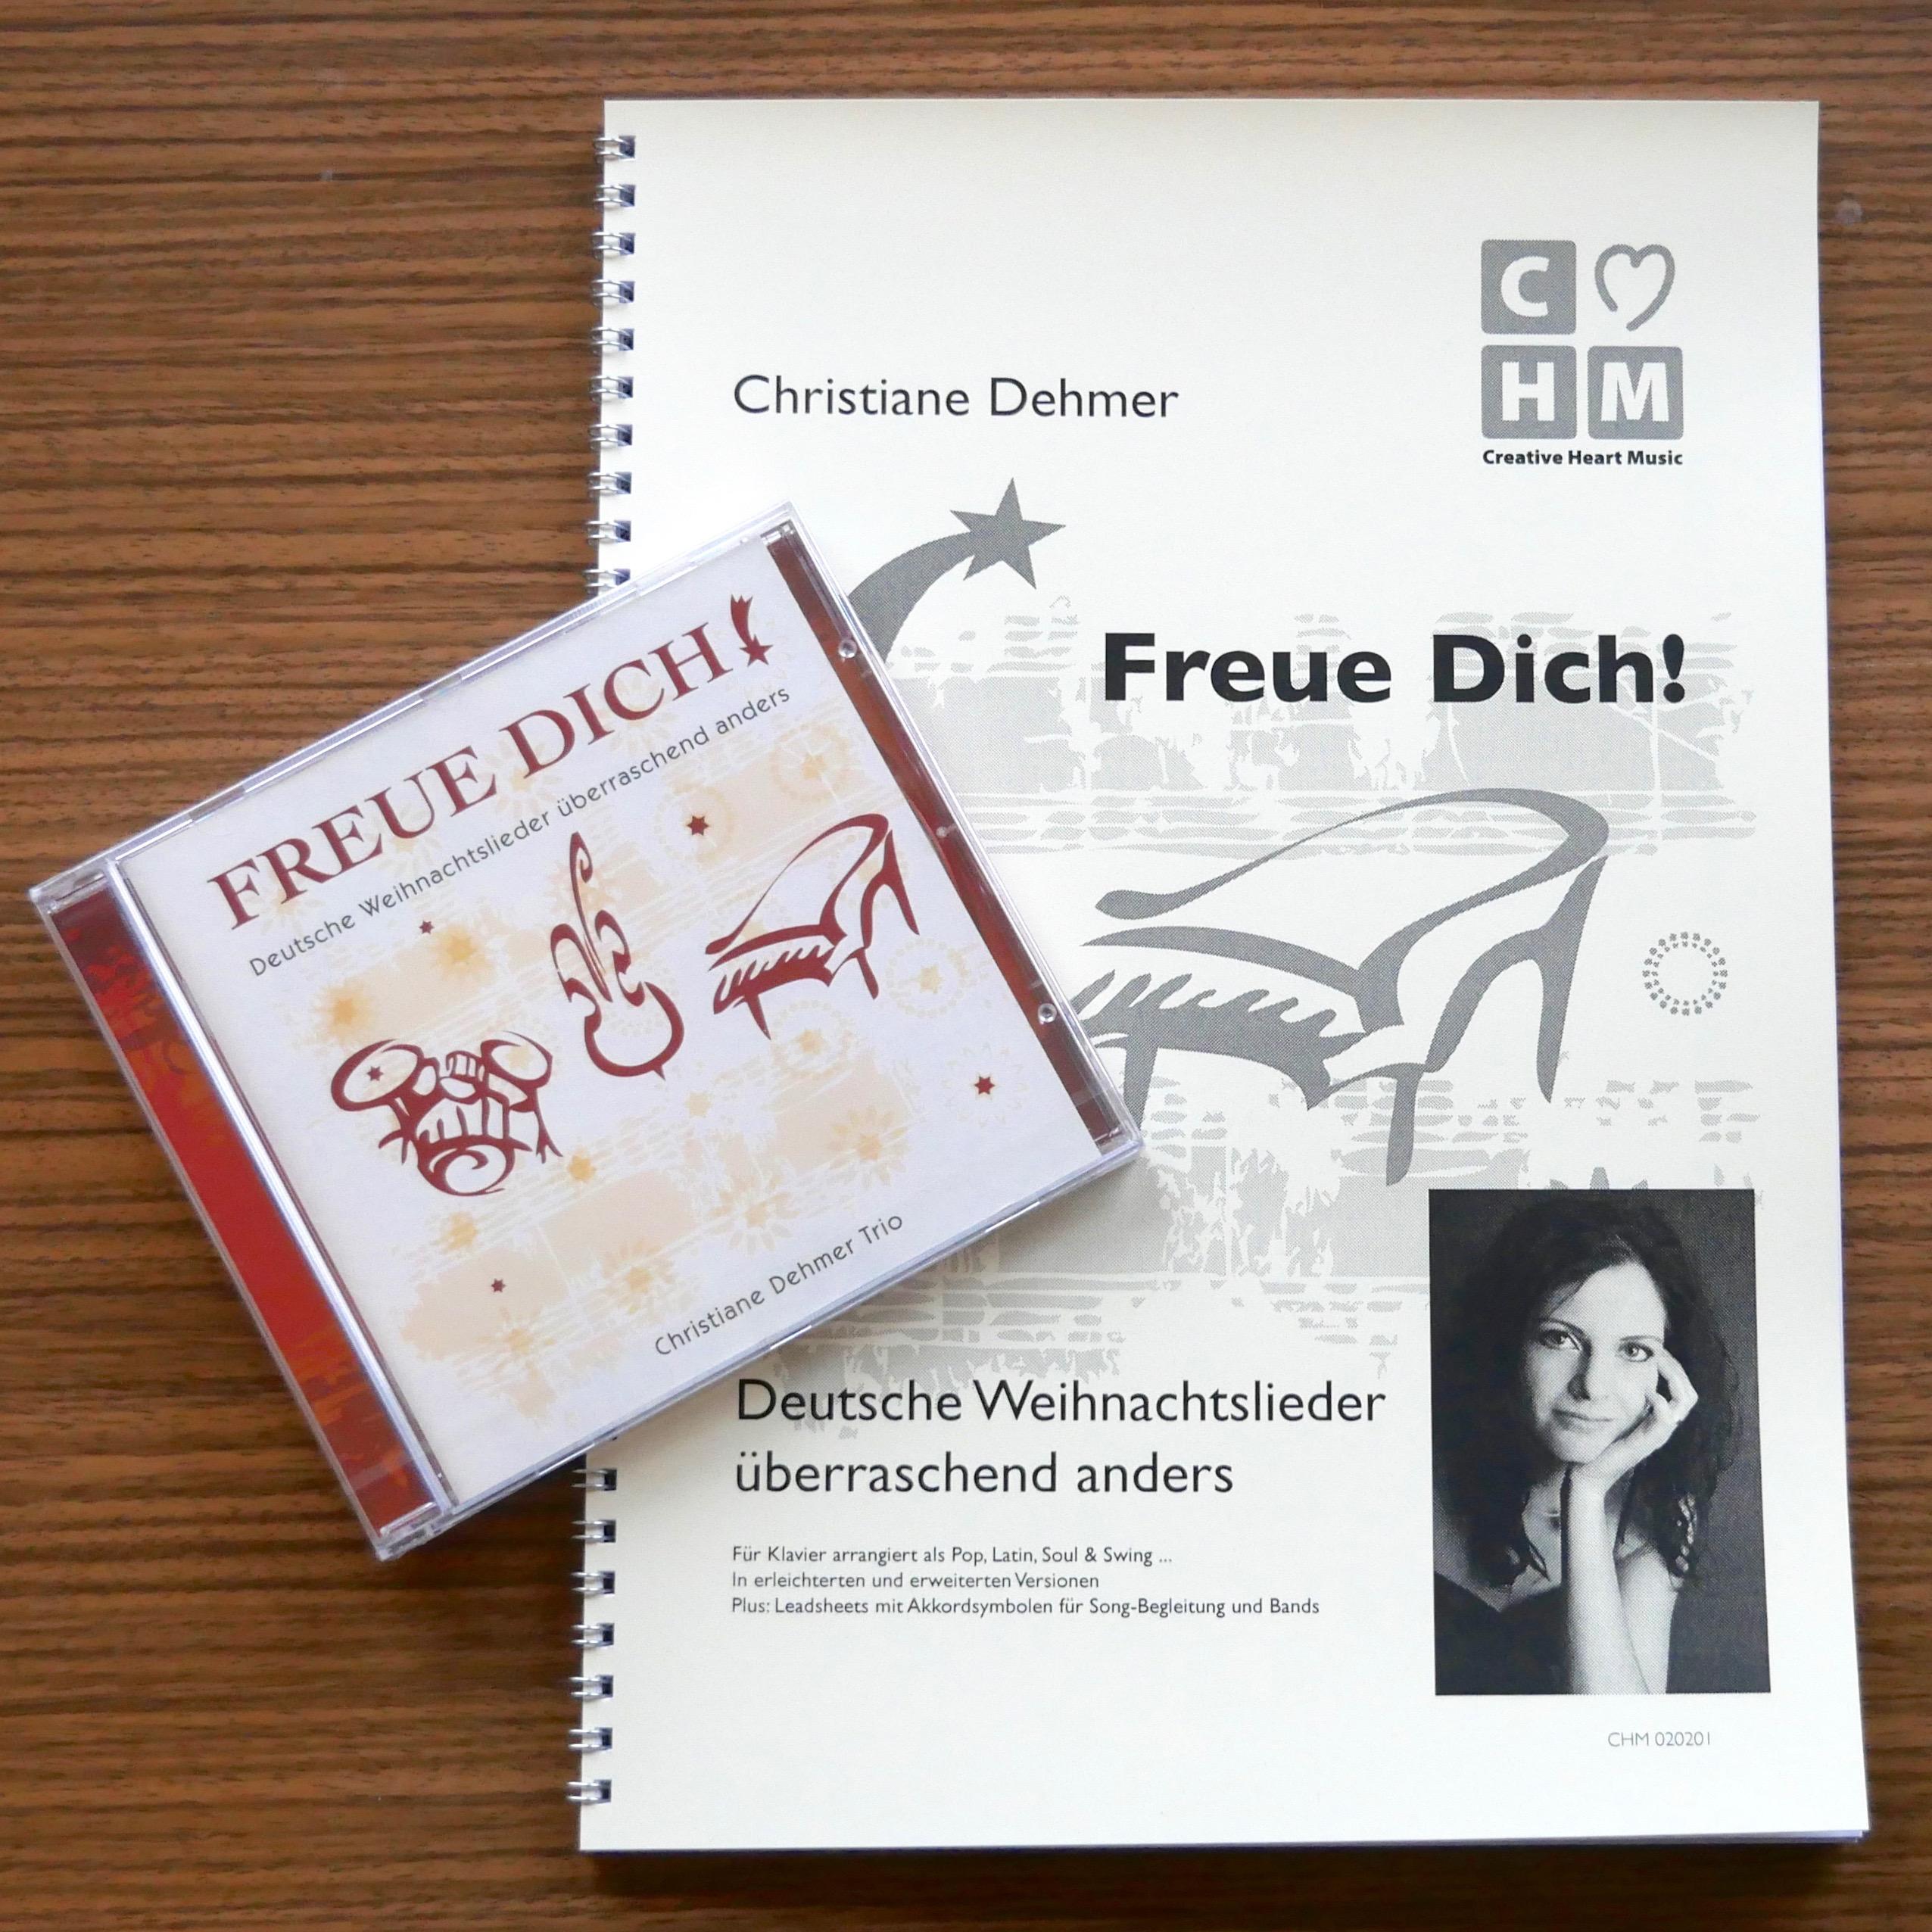 fd-cd-noten_bundle